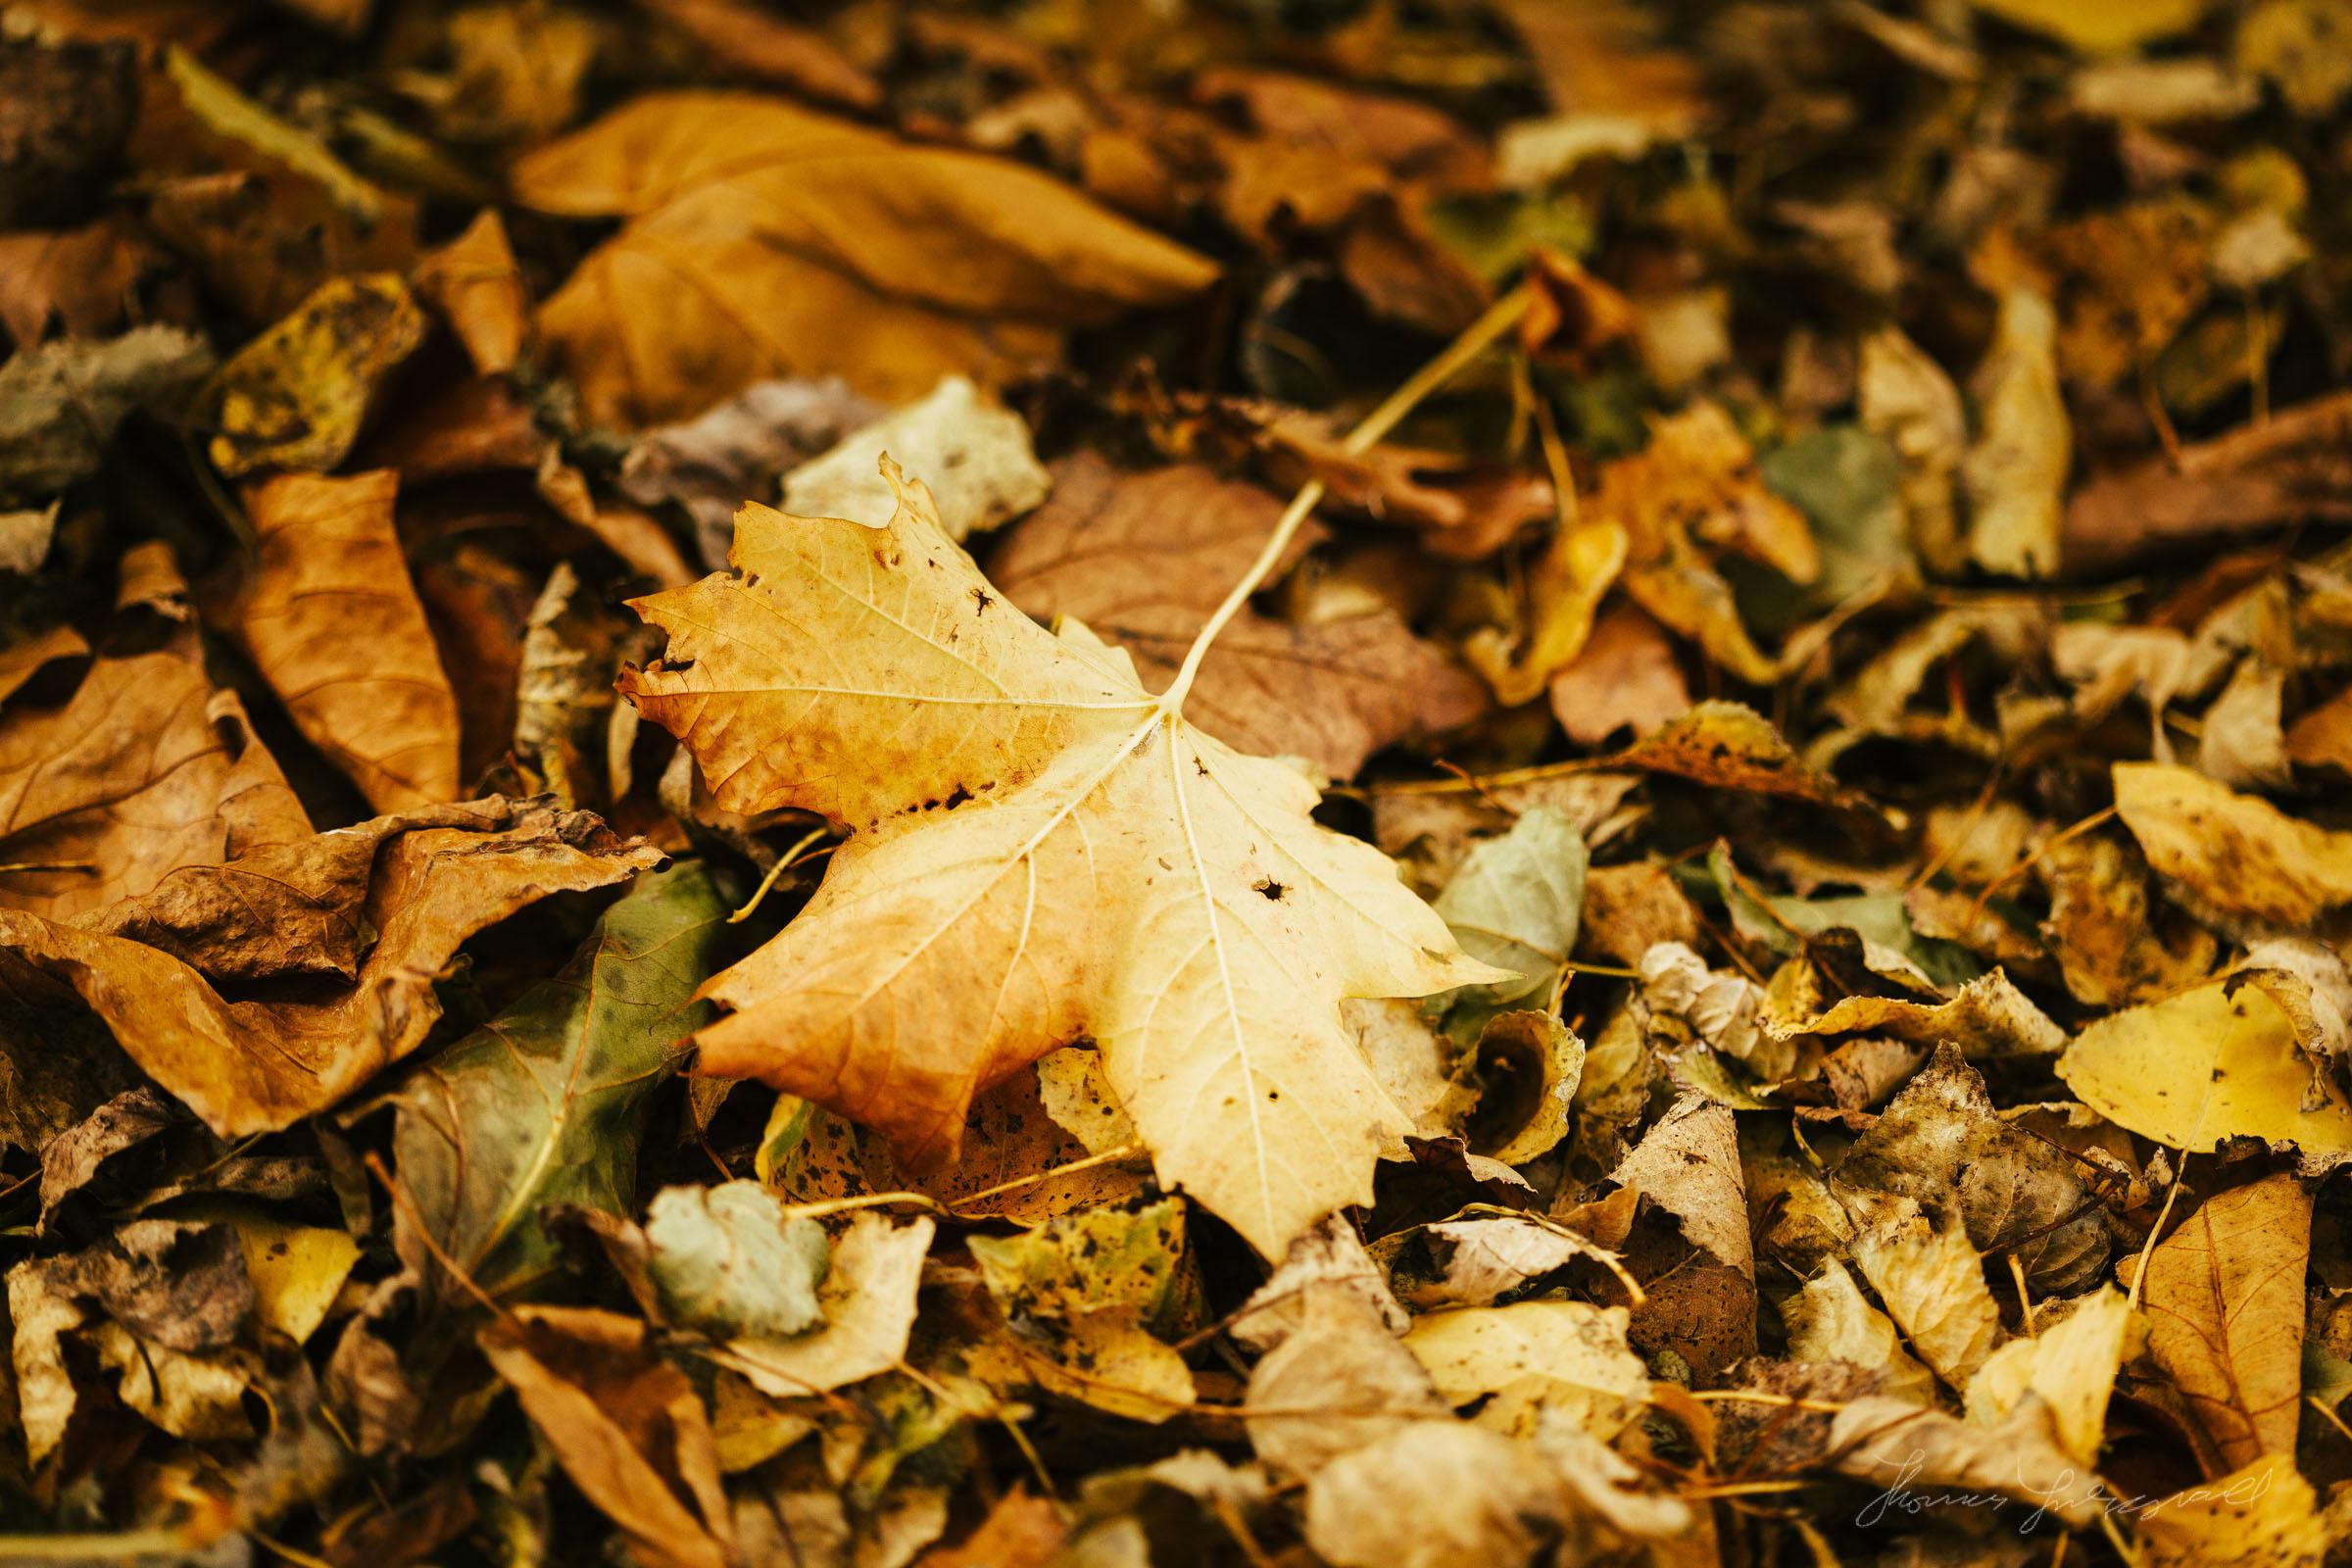 Yellow leaf on fallen leaves